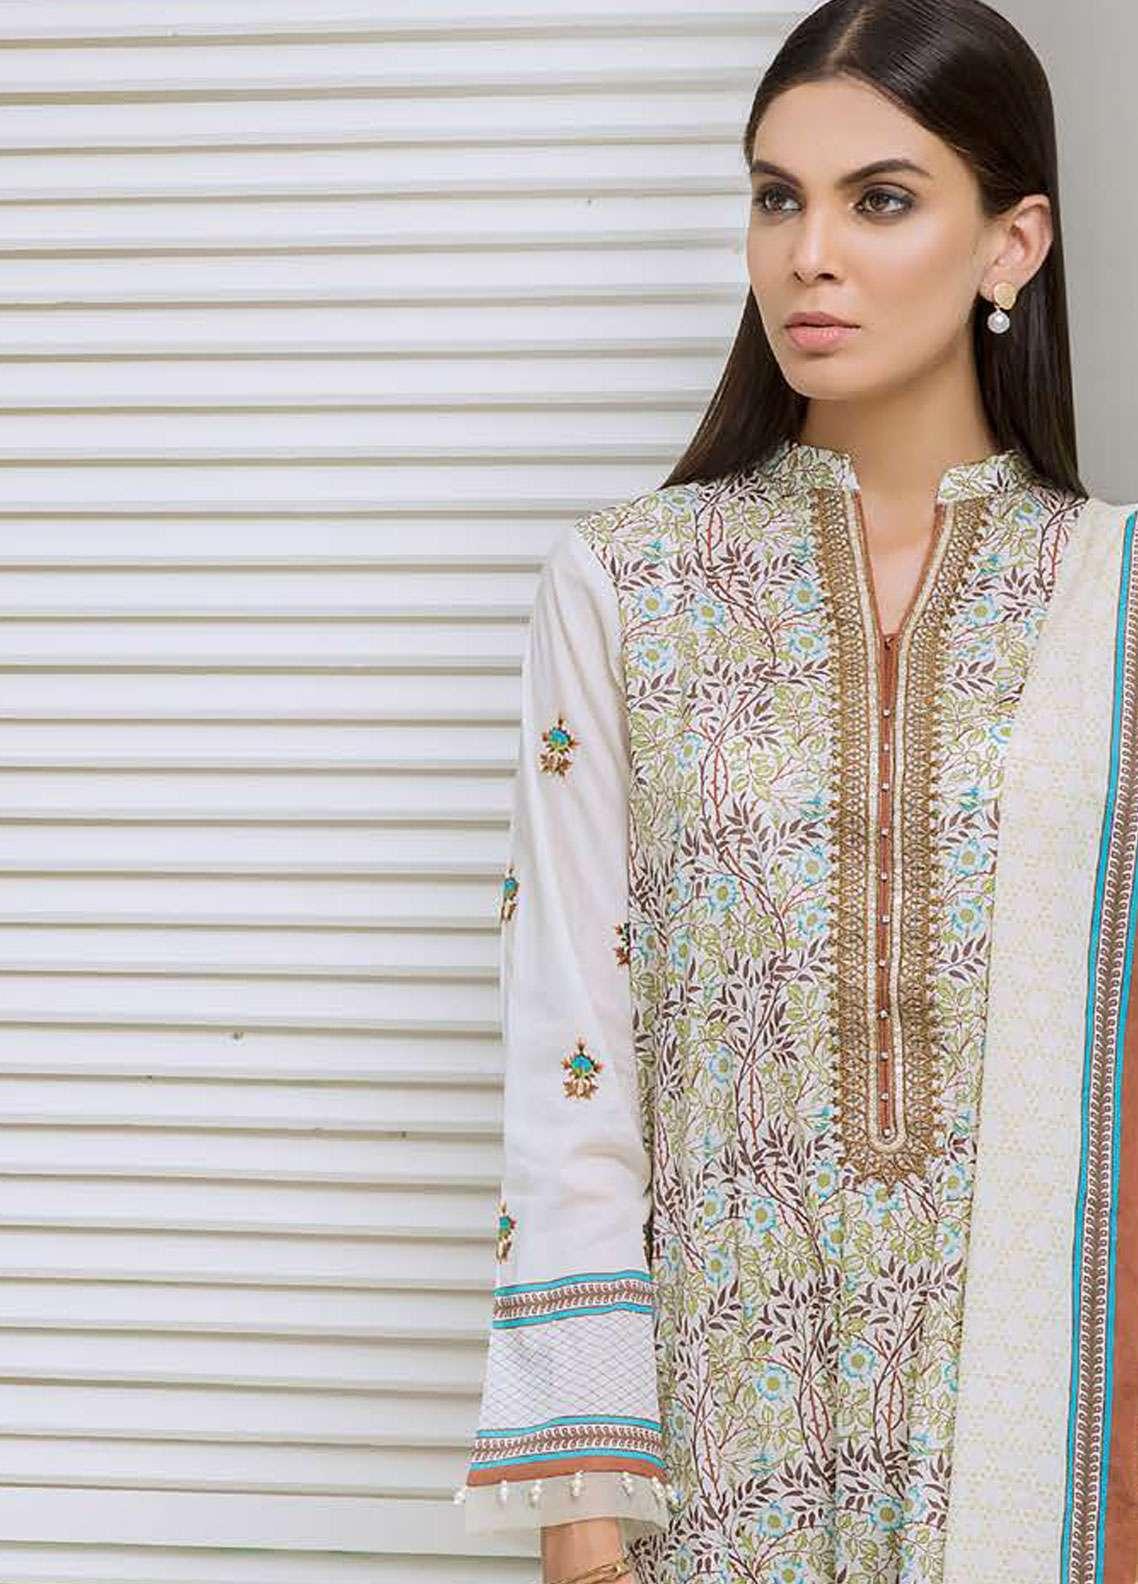 e4c0ad0e40 Orient Textile Embroidered Lawn Unstitched 3 Piece Suit OT19-L2 117 B -  Spring / Summer Collection